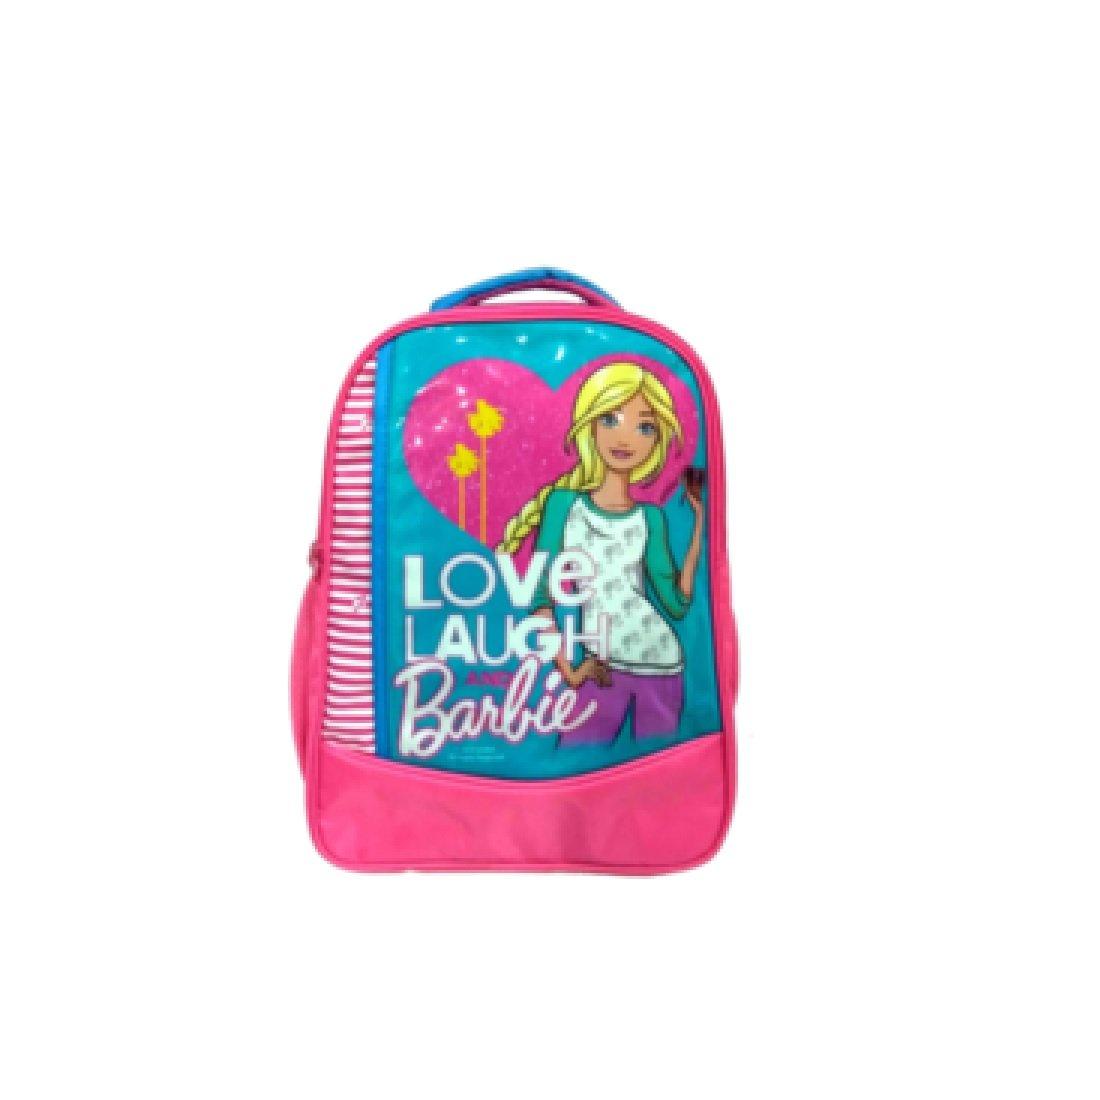 Barbie Blue School Backpack (MBE-MAT361)